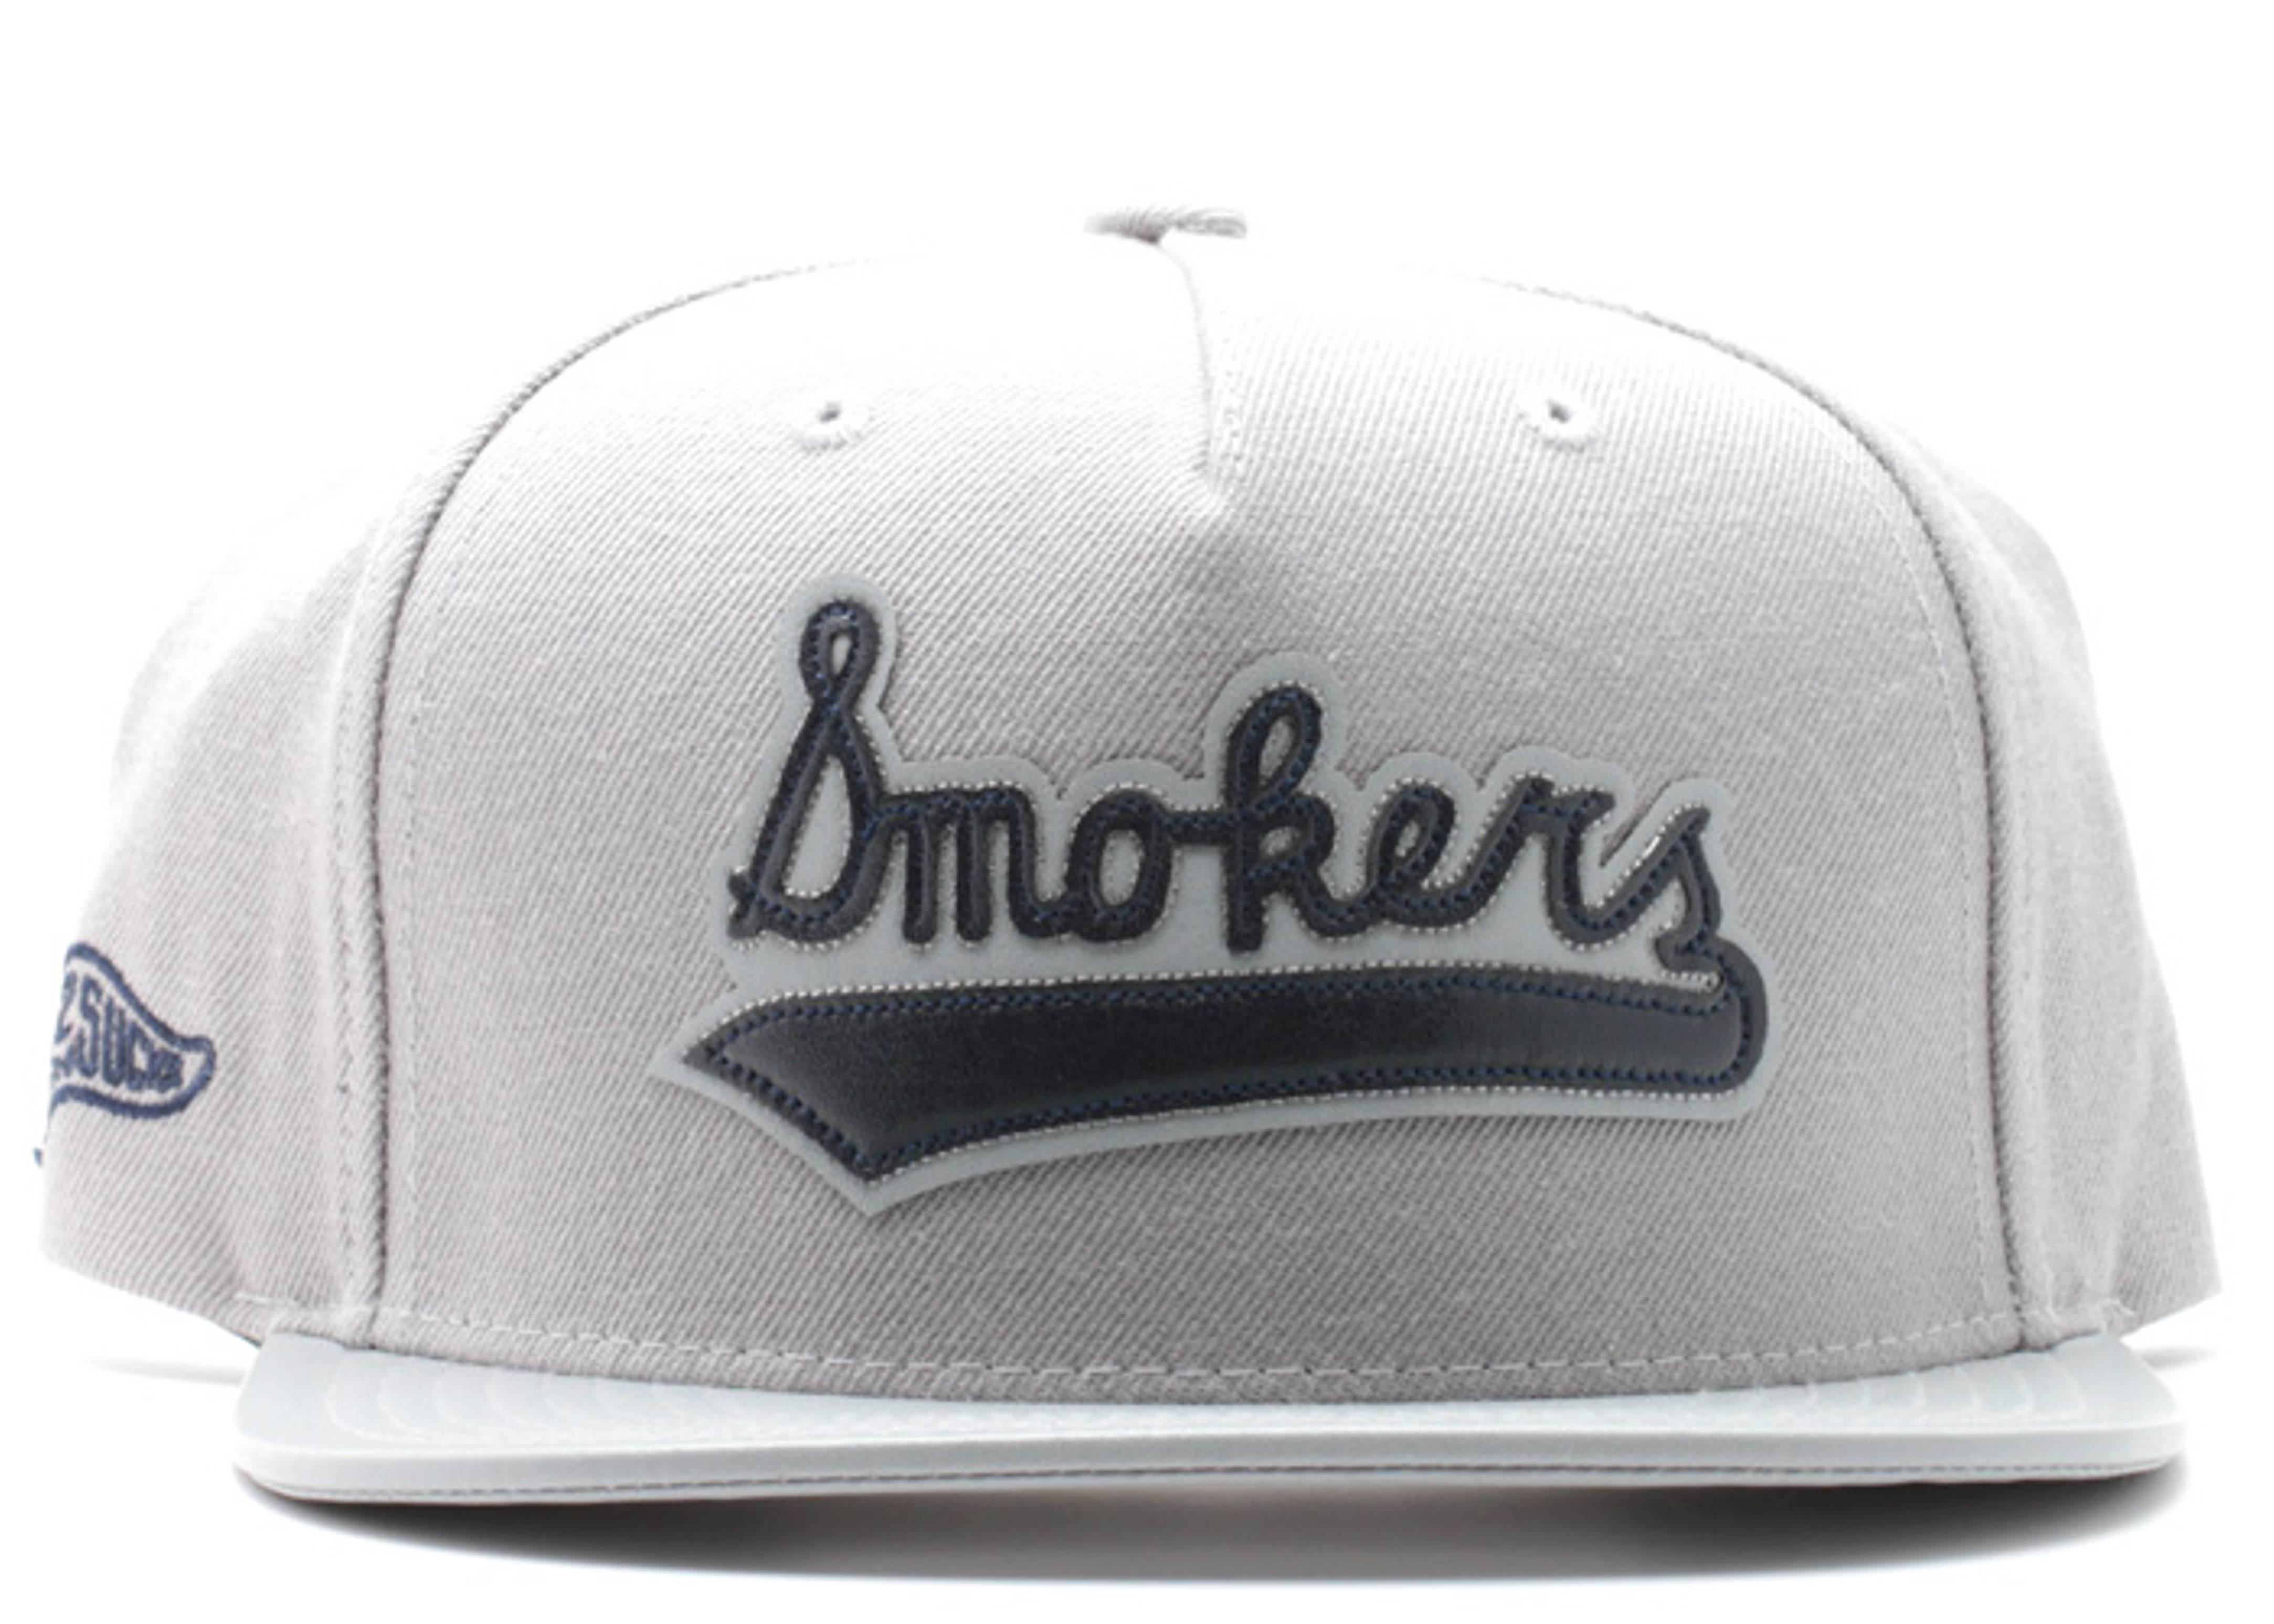 smokers snap-back